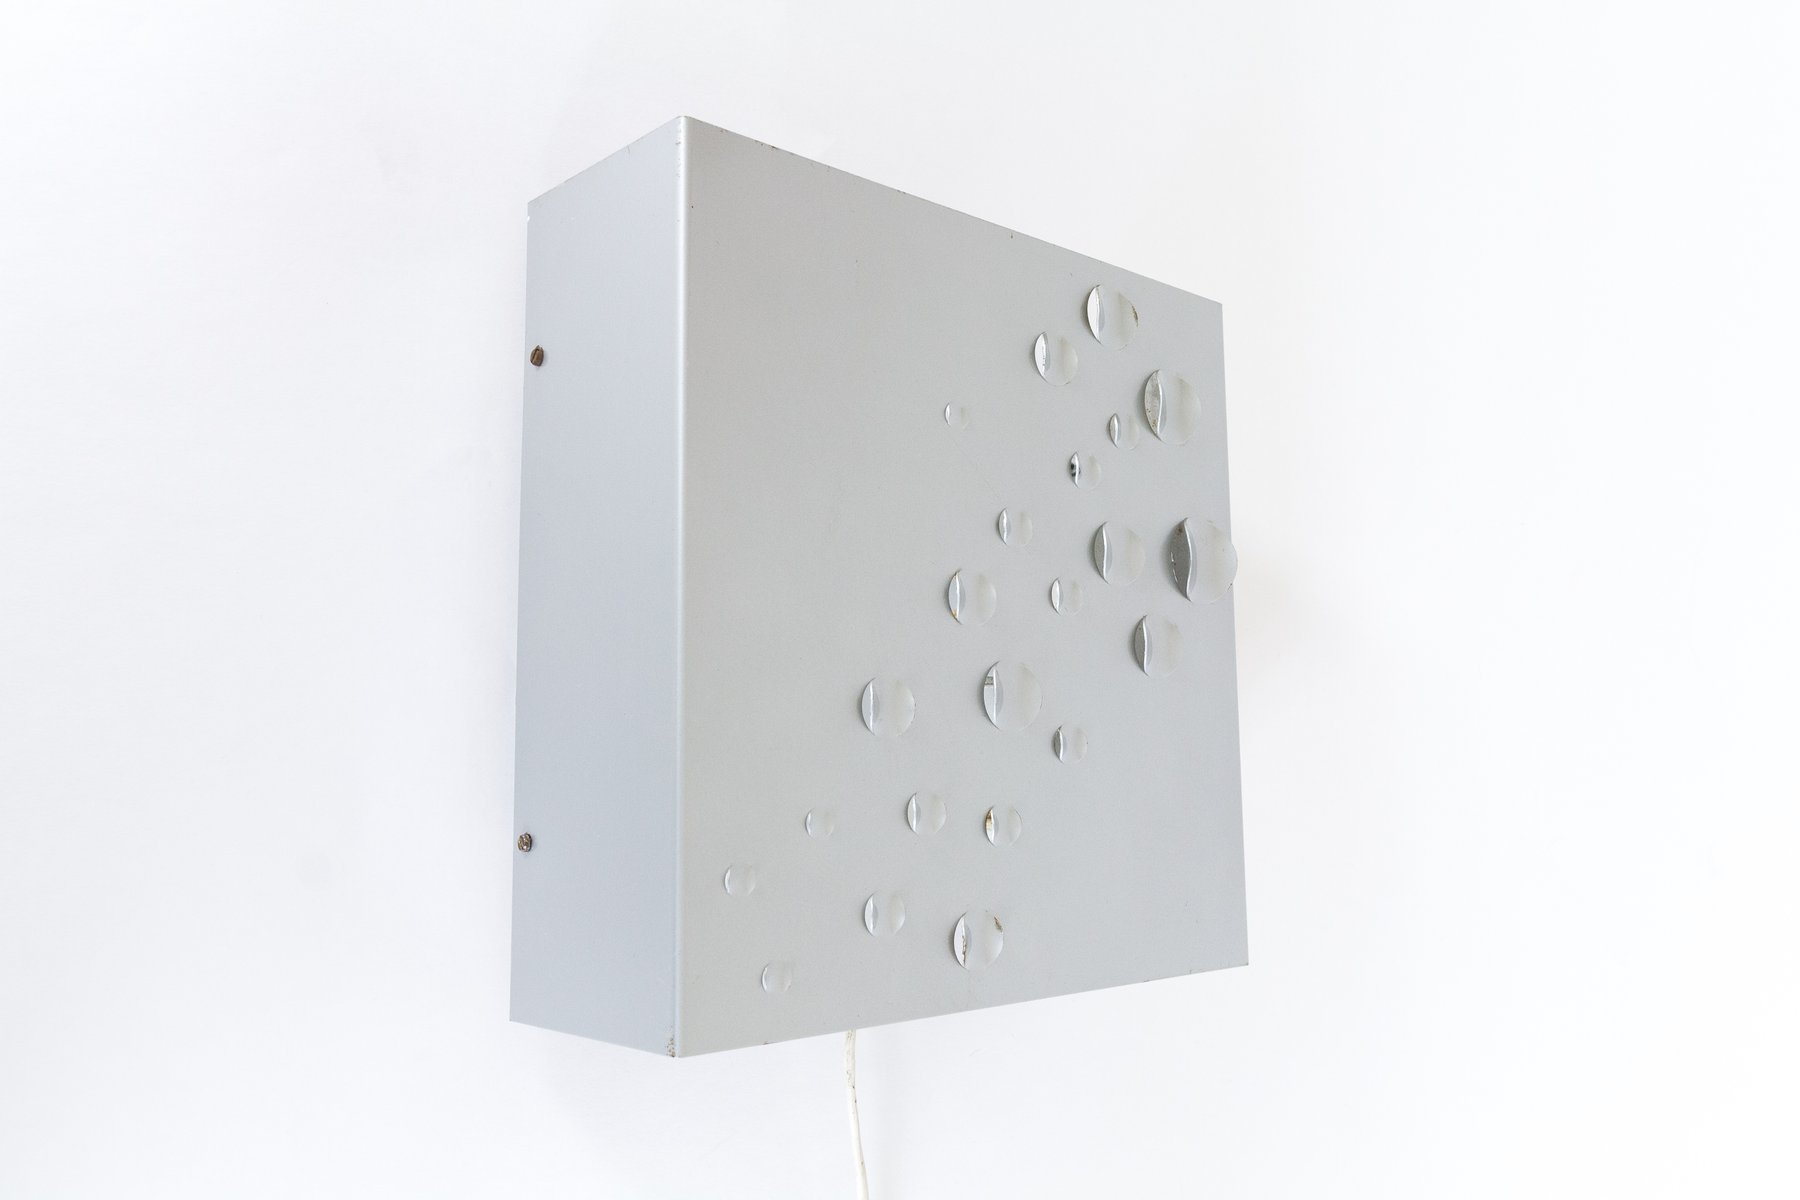 Modell Sterrenregen Wandlampe von Evert Jelle Jelles für Raak, 1960er